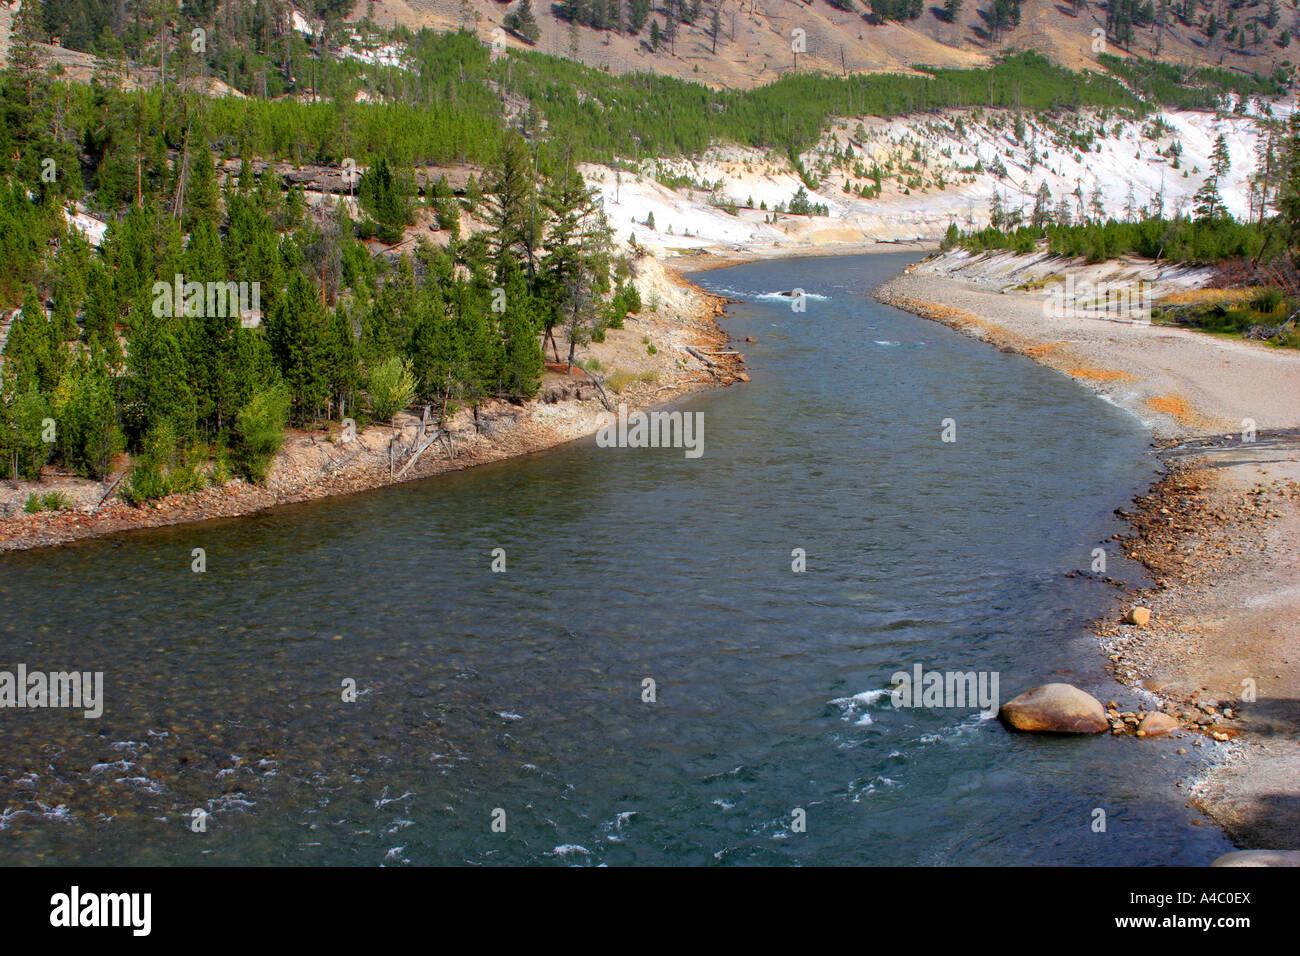 yellowstone river, yellowstone national park, wyoming Stock Photo